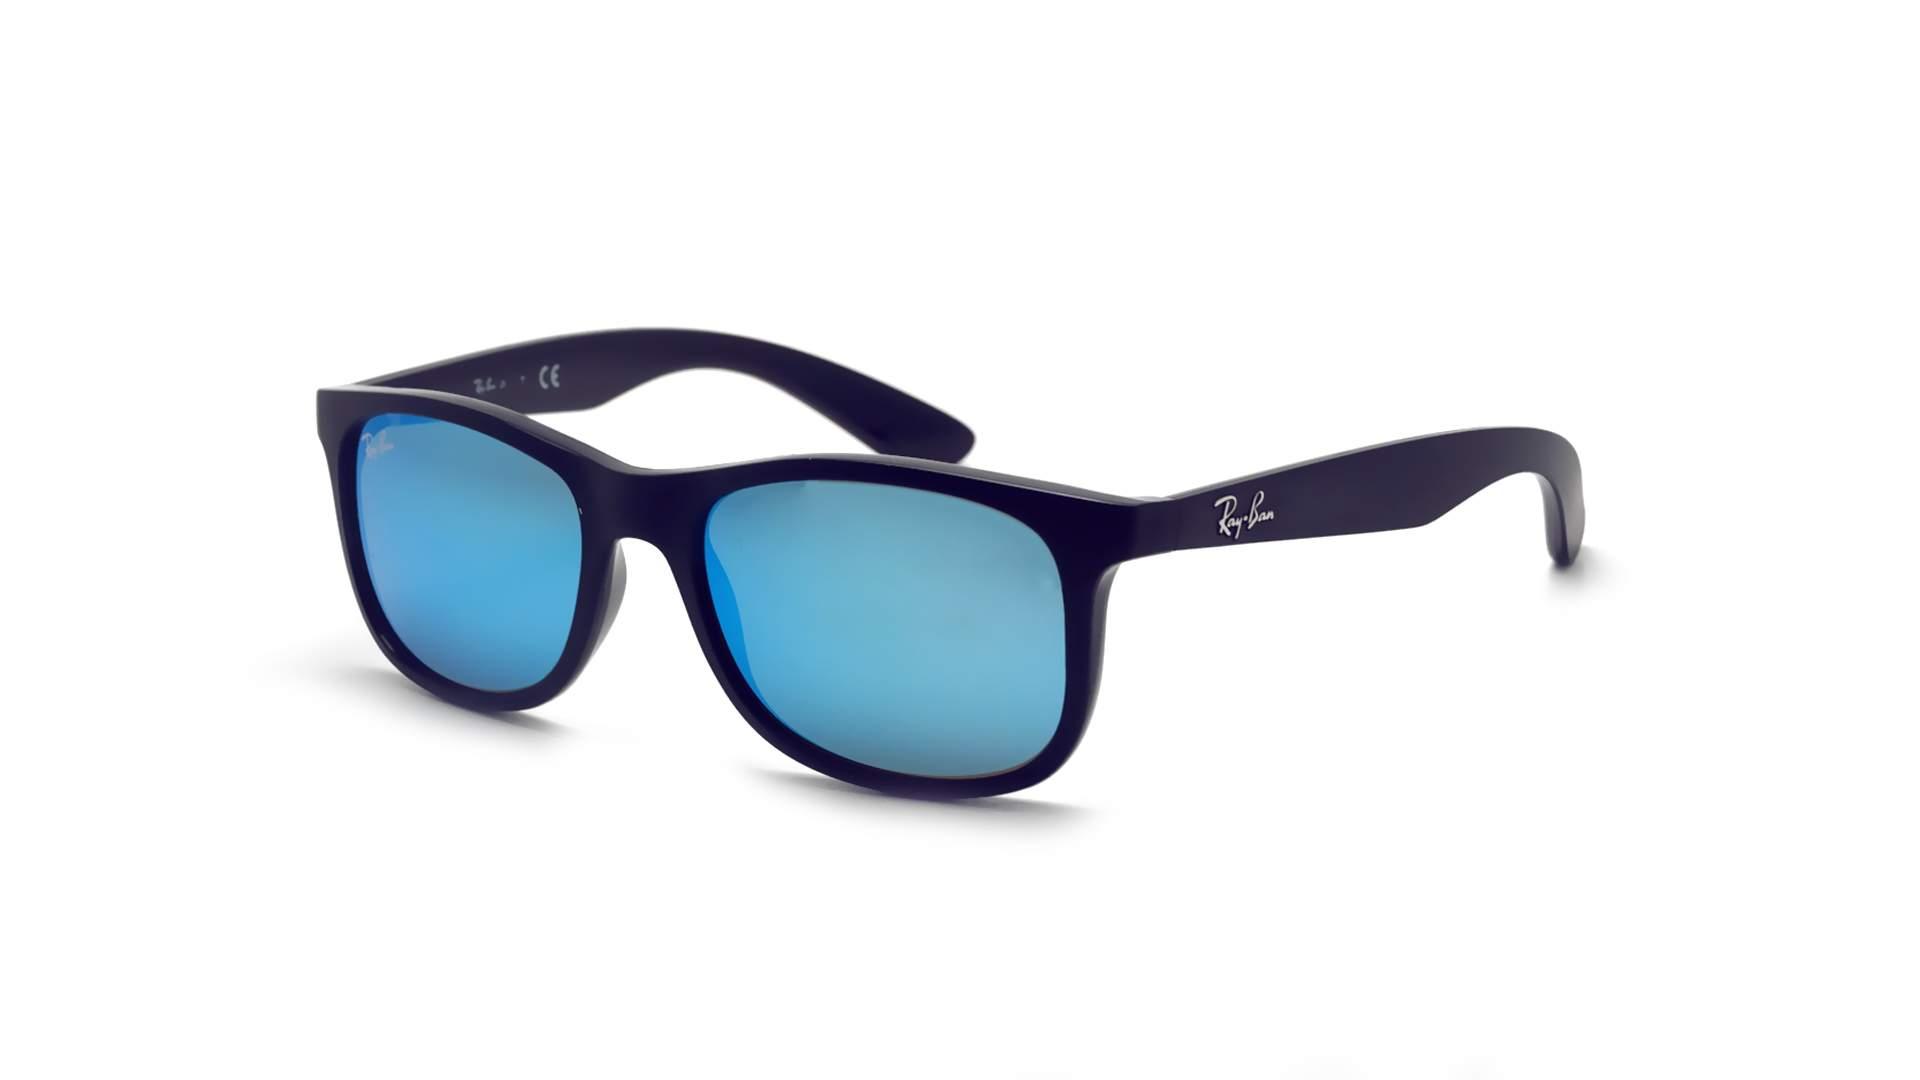 e998fba6d2d Sunglasses Ray-Ban RJ9062S 7013 55 48-16 Blue Matte Junior Mirror